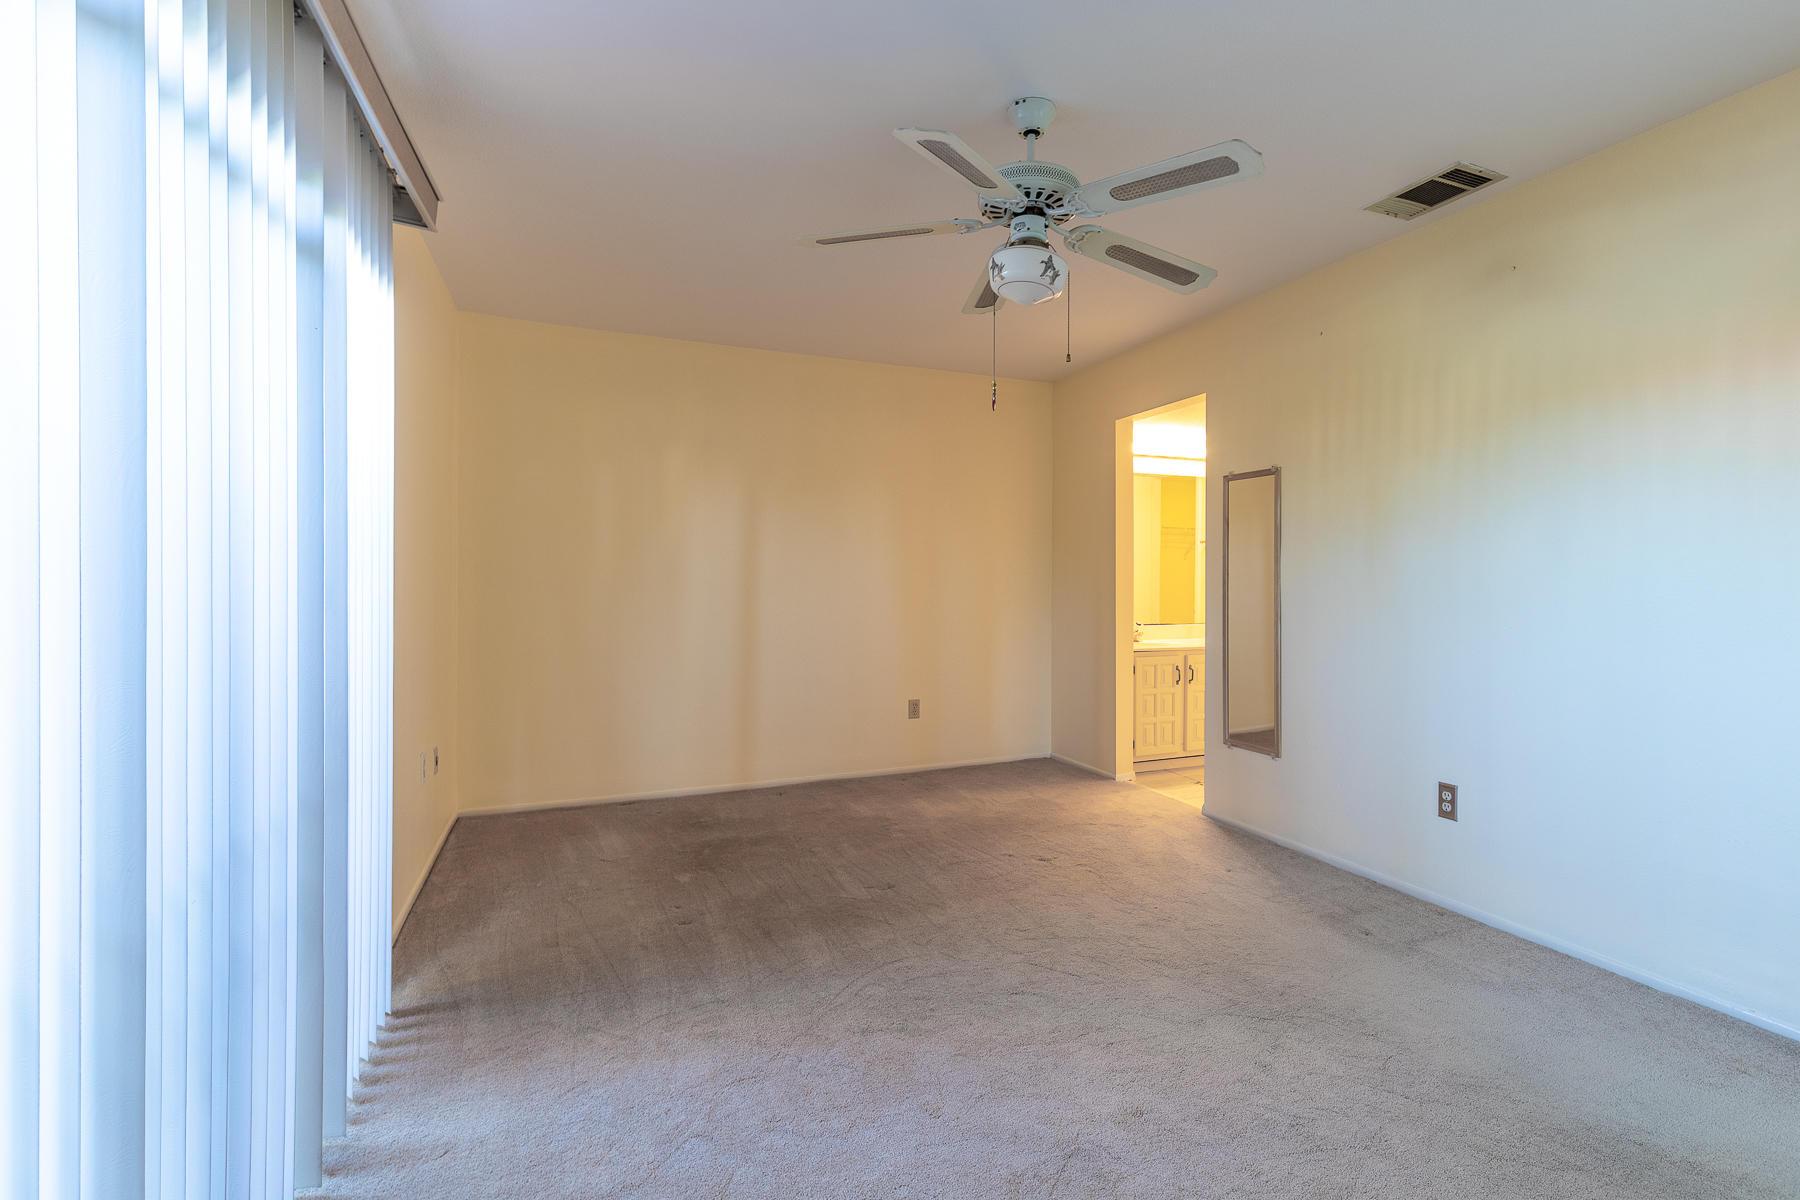 3413 Se Sandpiper Circle, Port Saint Lucie, FL 34952